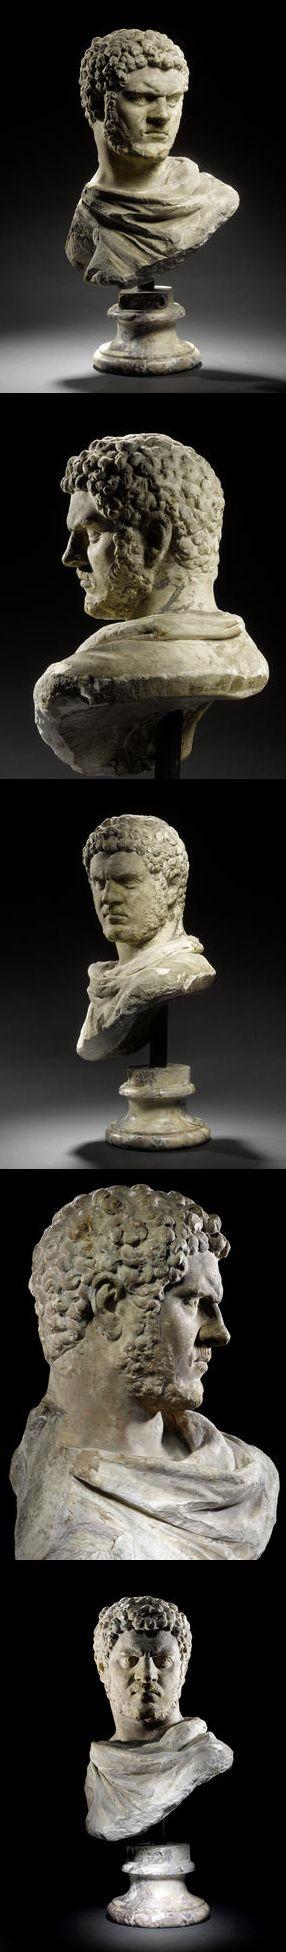 A Roman marble bust of the Emperor Caracalla  Late Severan Period, A.D. 212-217